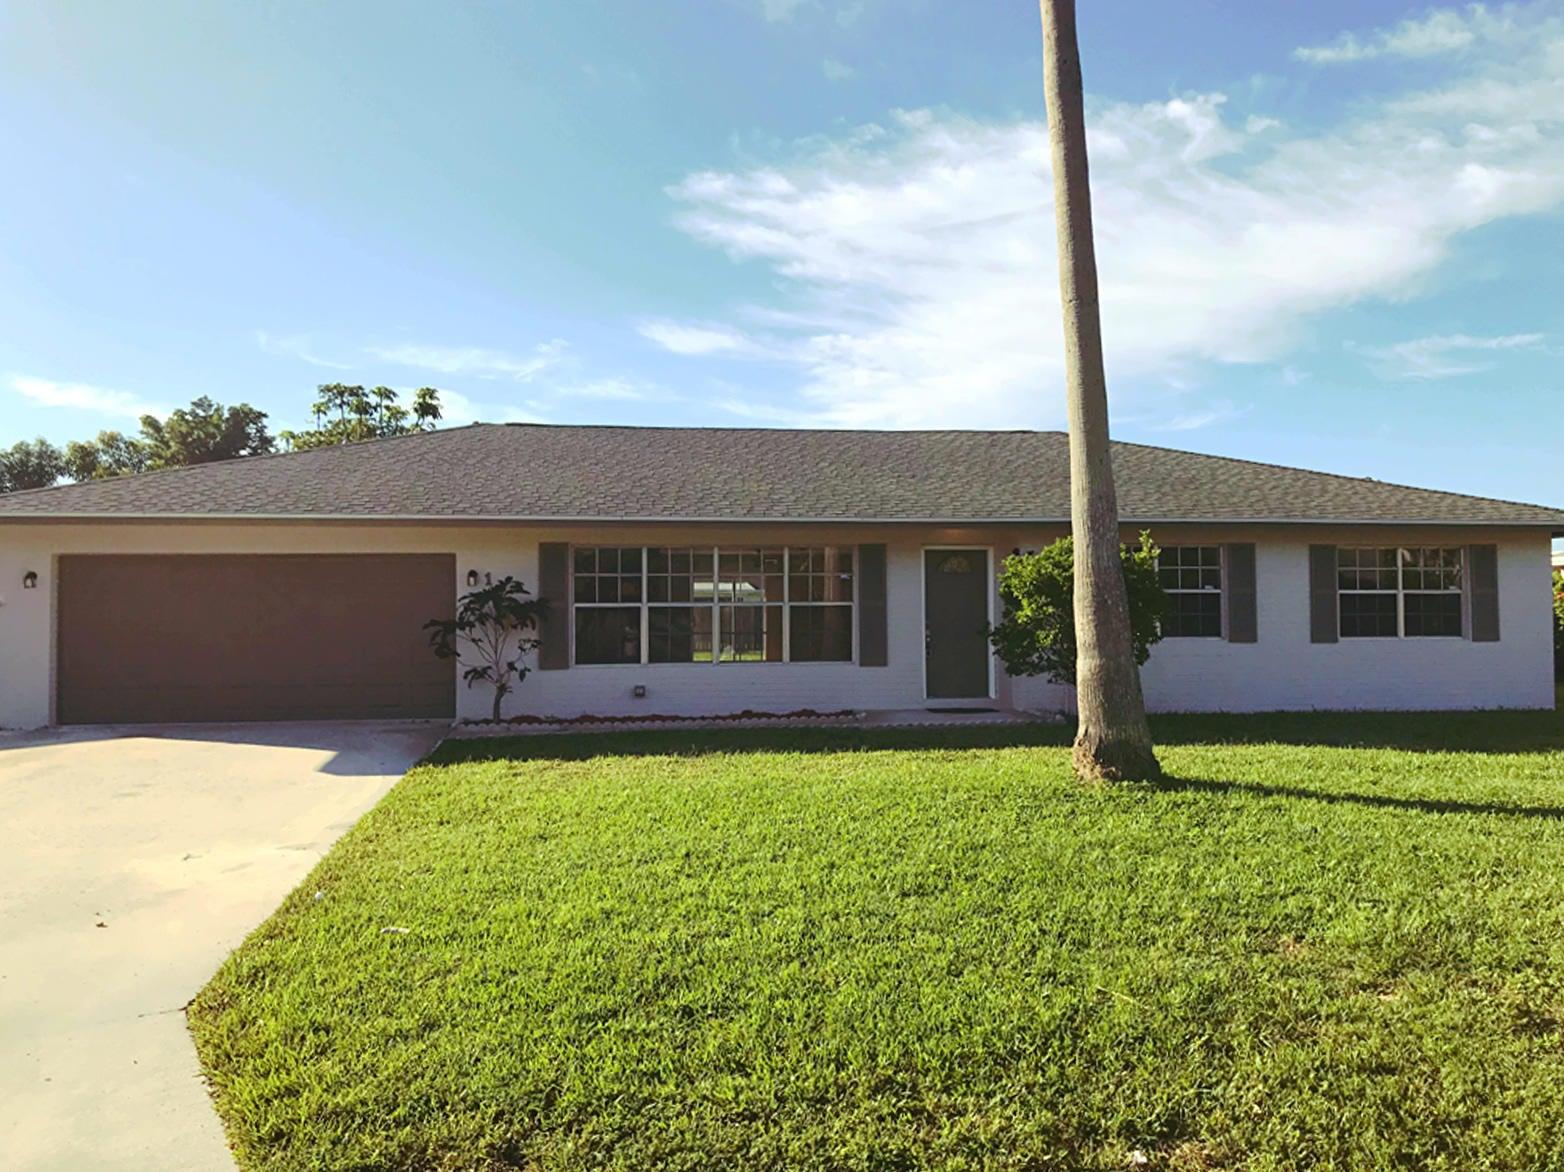 102 Oriole Court, Royal Palm Beach, FL 33411